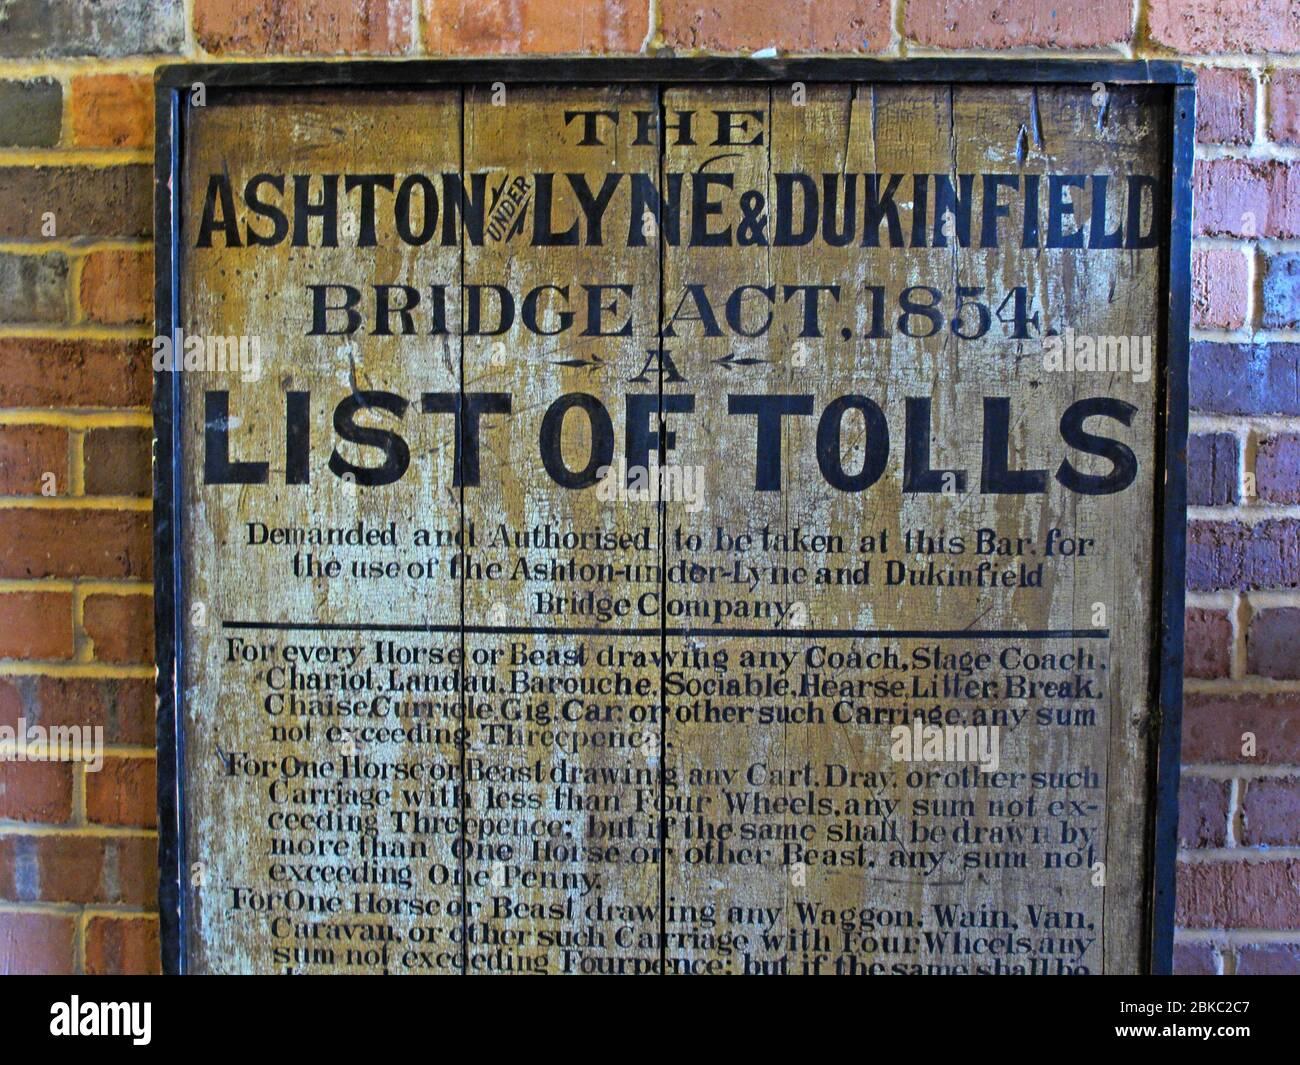 Dieses Stockfoto: Ashton unter Lyne, Dukinfield, Bridge, Tolls, Mautliste, Greater Manchester, GMC, Manchester, England, UK - 2BKC2C